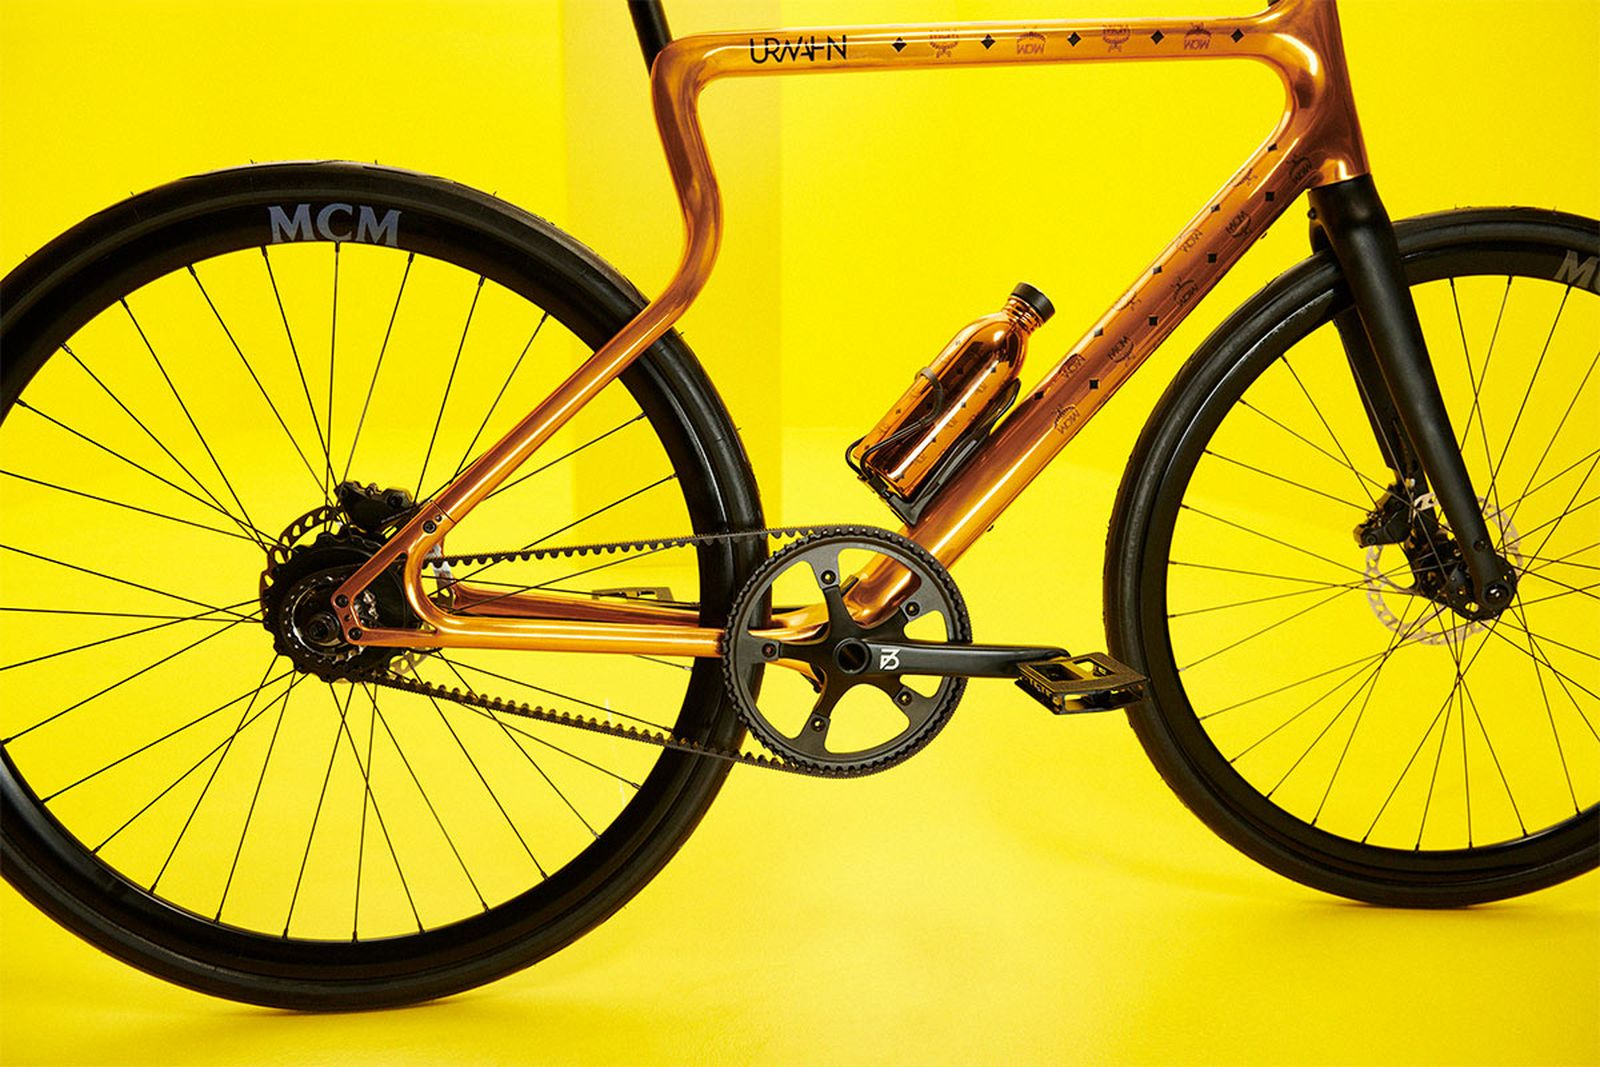 mcm-urwahn-e-bike-05